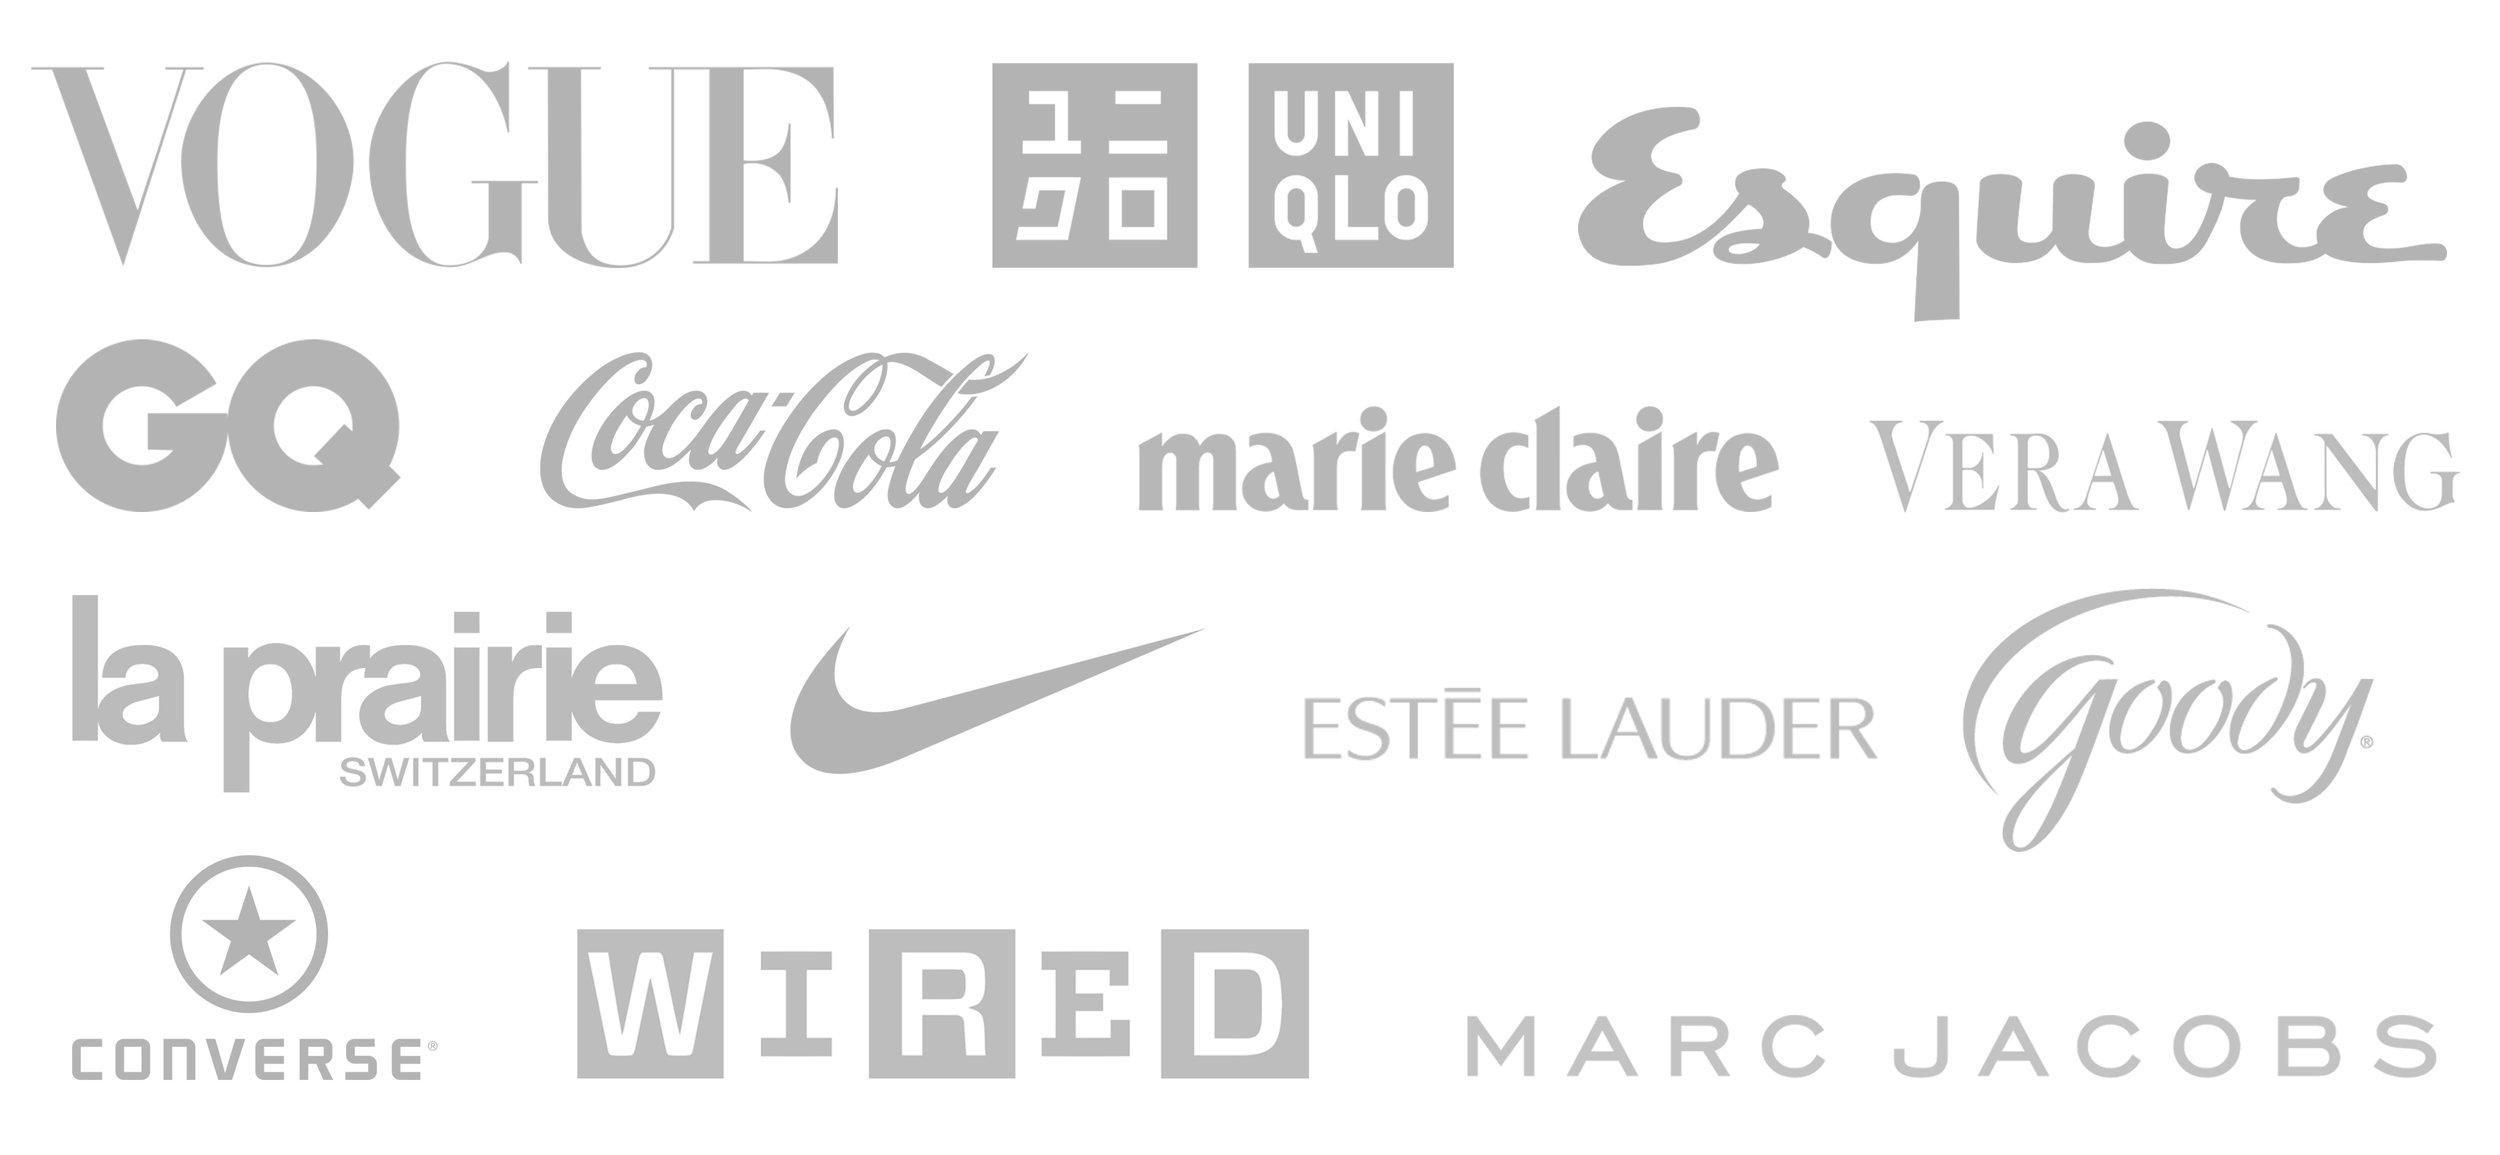 logos copy.jpg